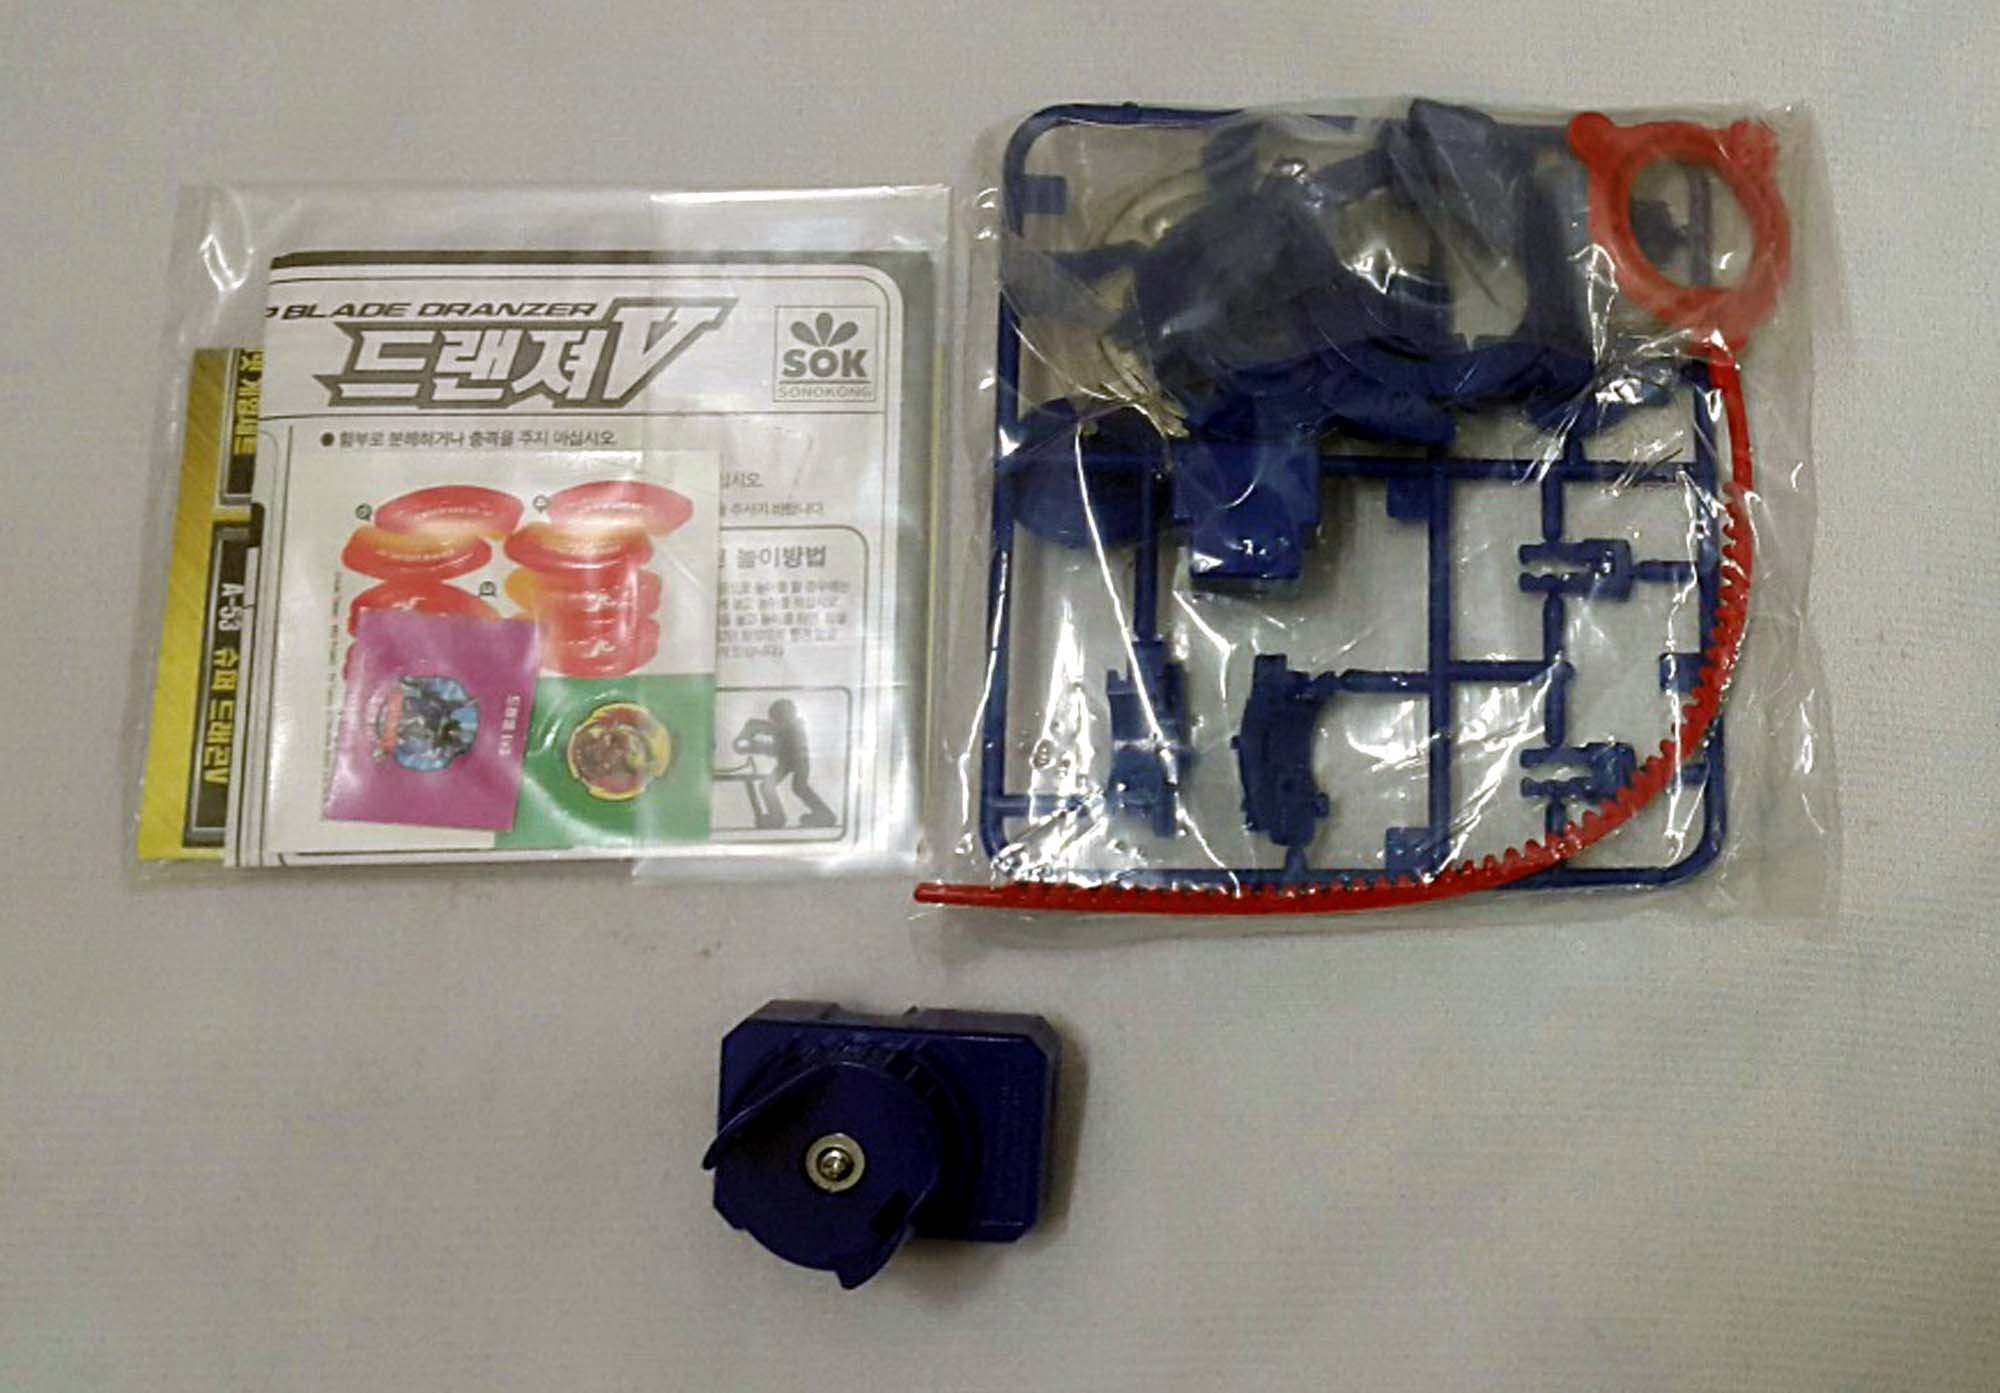 Takara Beyblade Topblade - Dranzer V(a-47) Sonokong